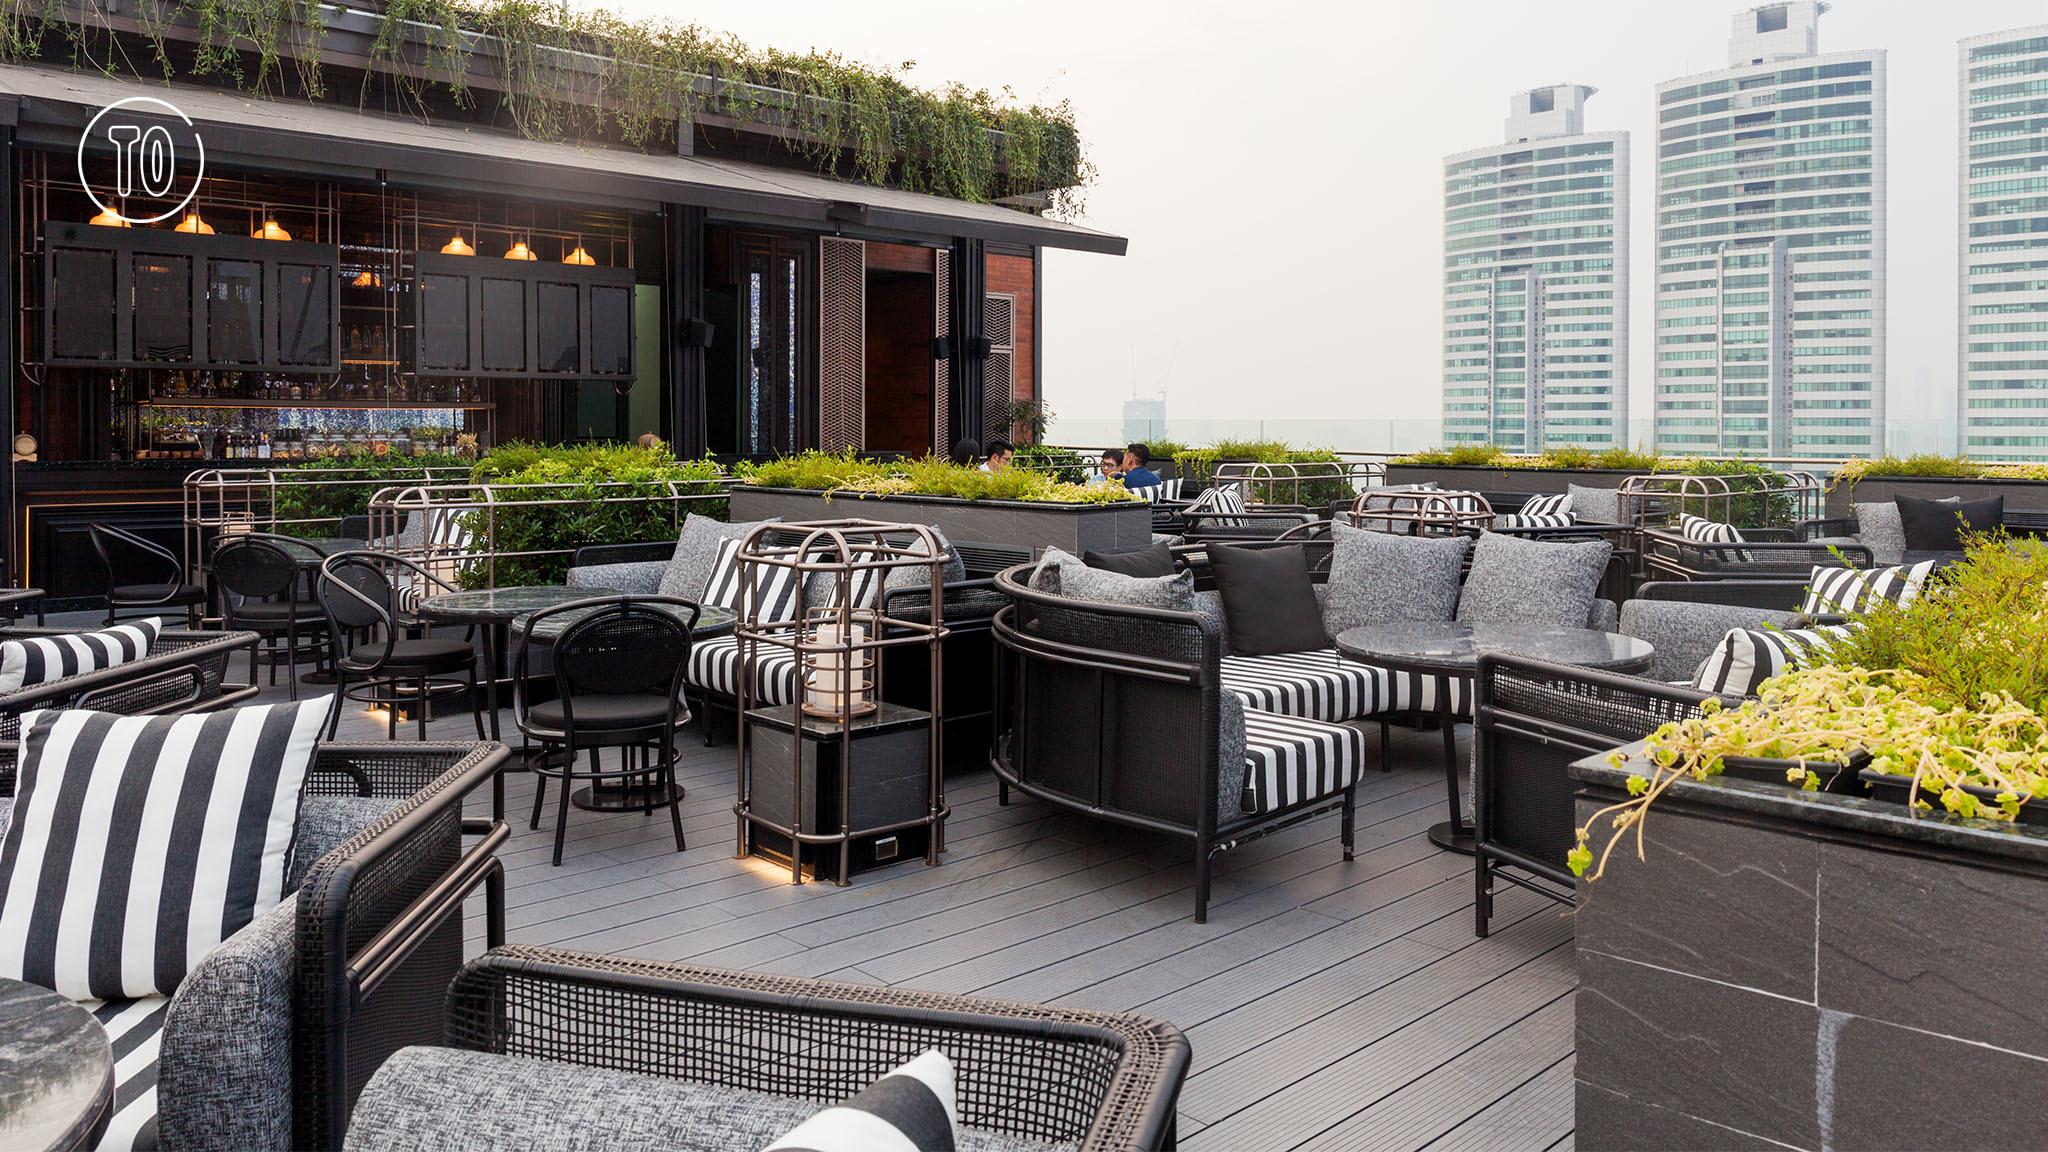 A Bar cocktail rooftop bar